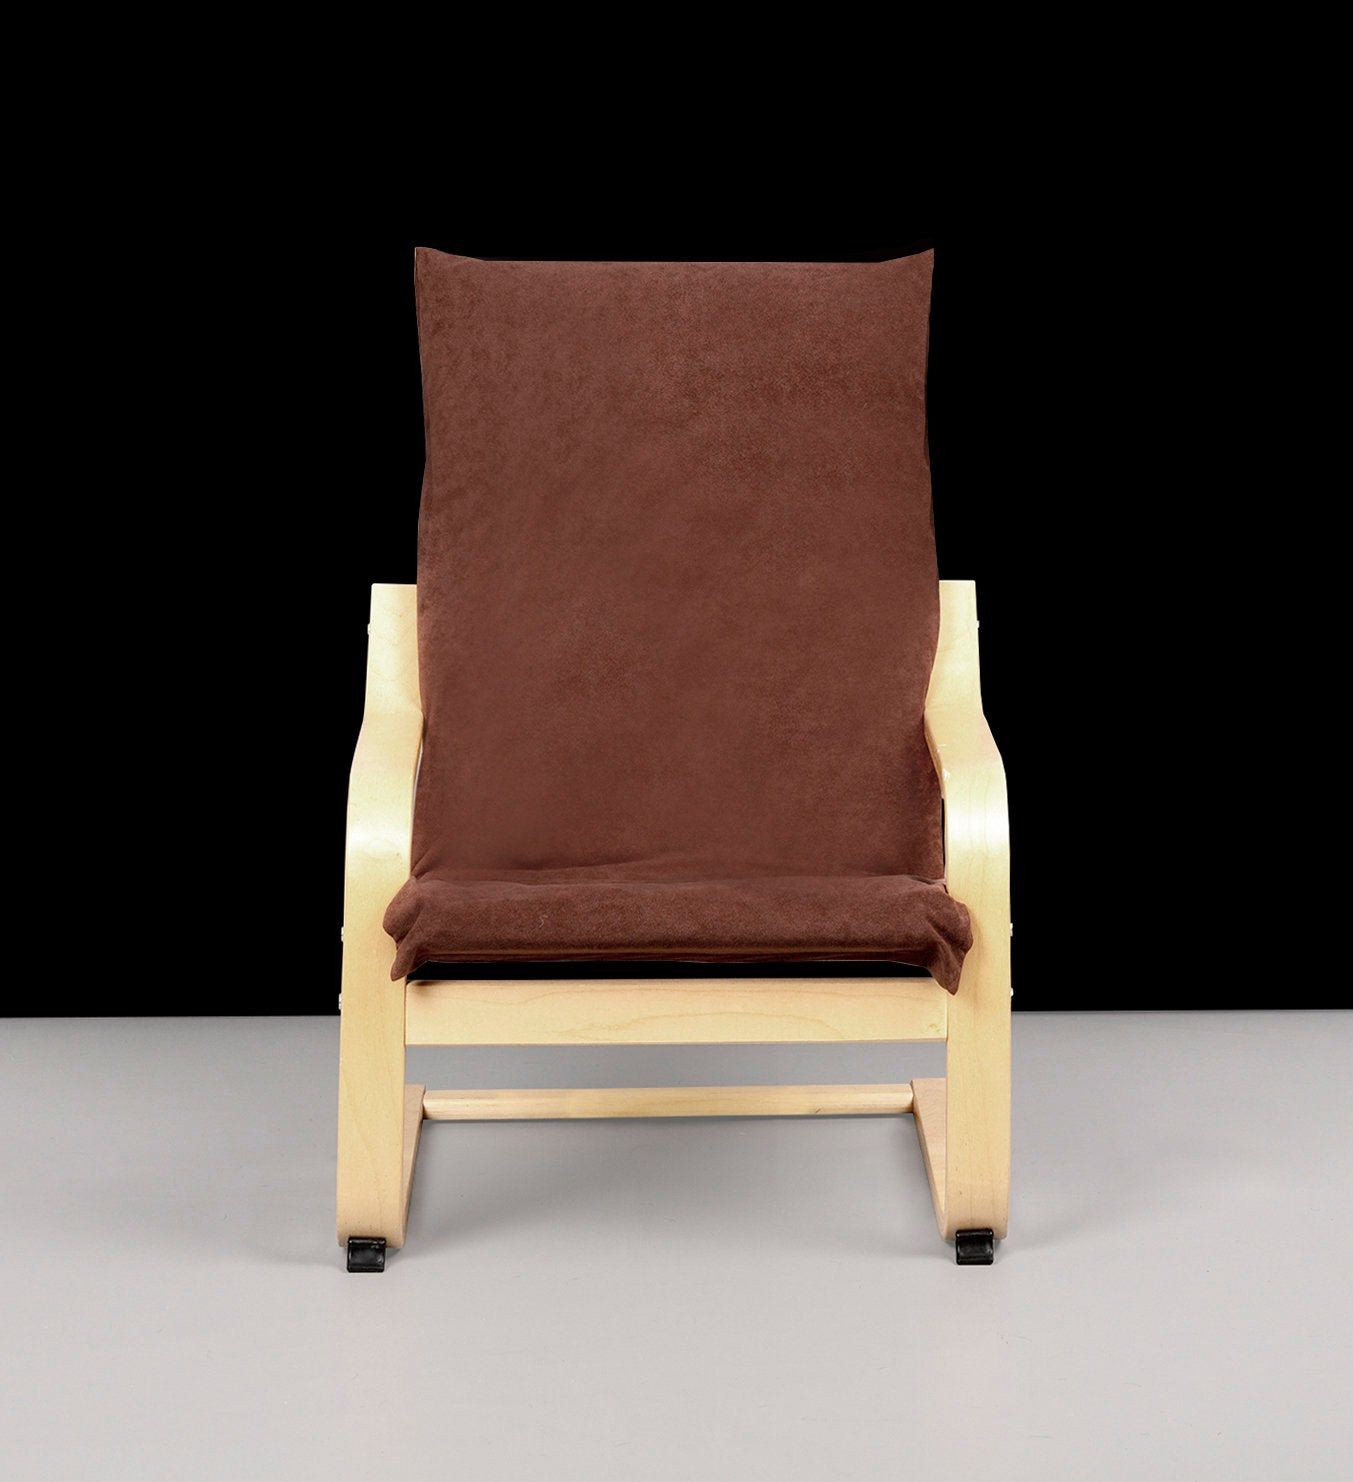 Suede Brown Flocked Leaf Print IKEA KIDS POÄNG Cushion